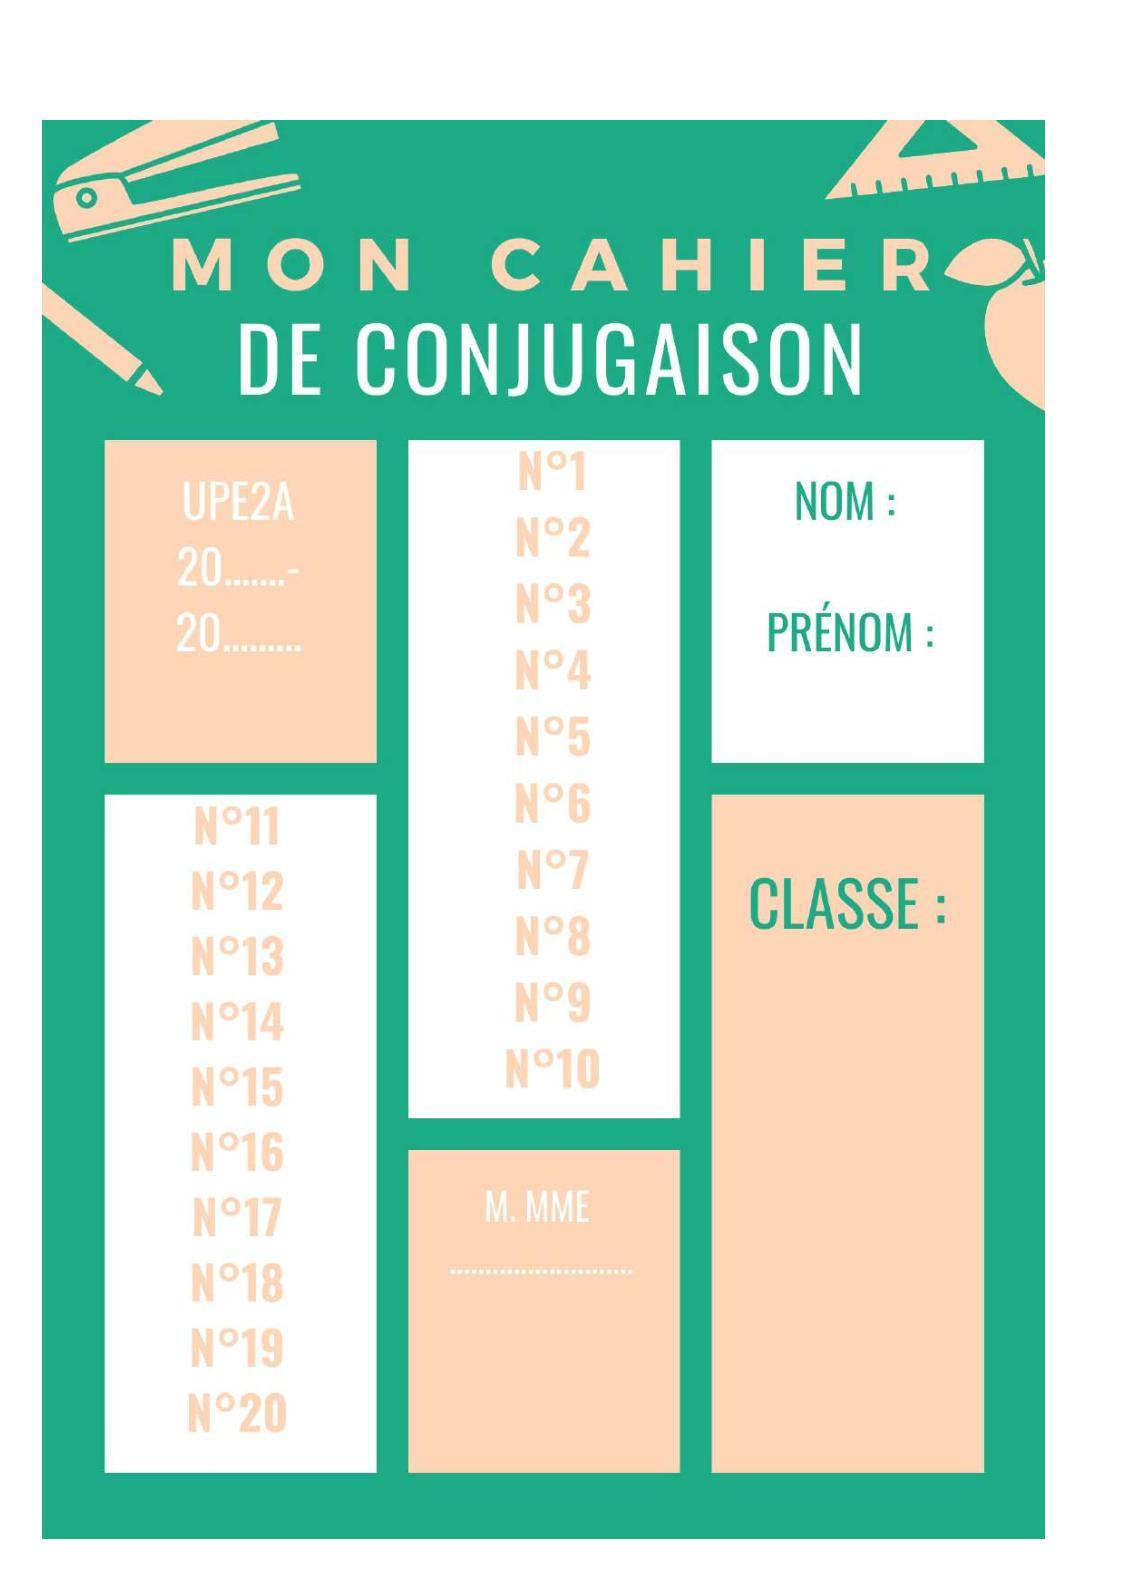 Je N'ai Pas Pu Conjugaison : conjugaison, Calaméo, Cahier, Conjugaison